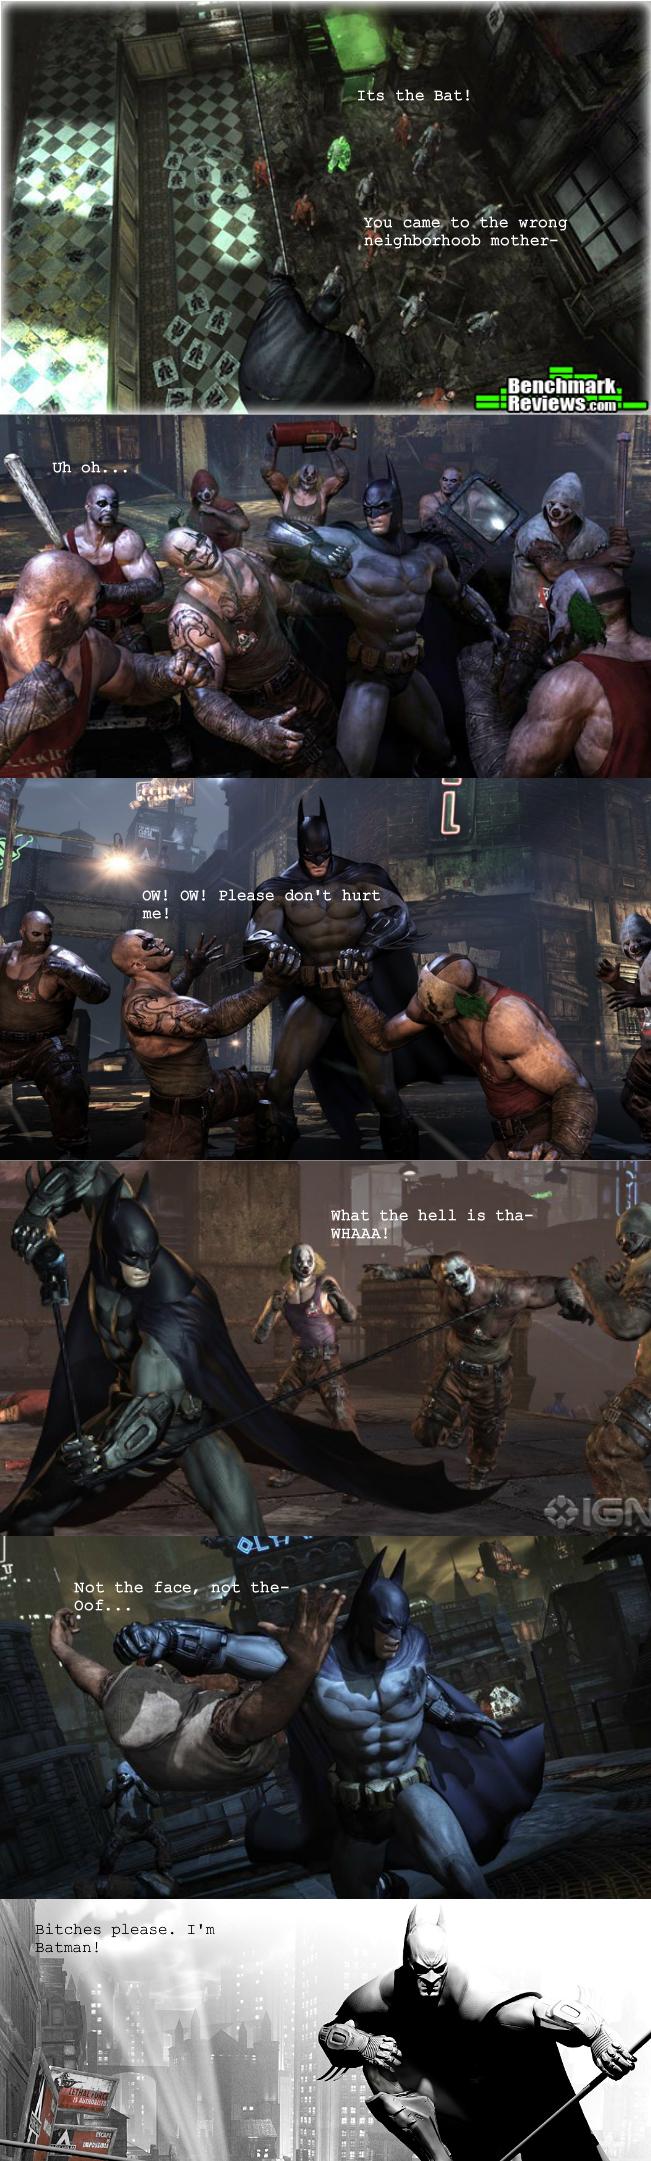 Batman. Batman.. What are you? 6?